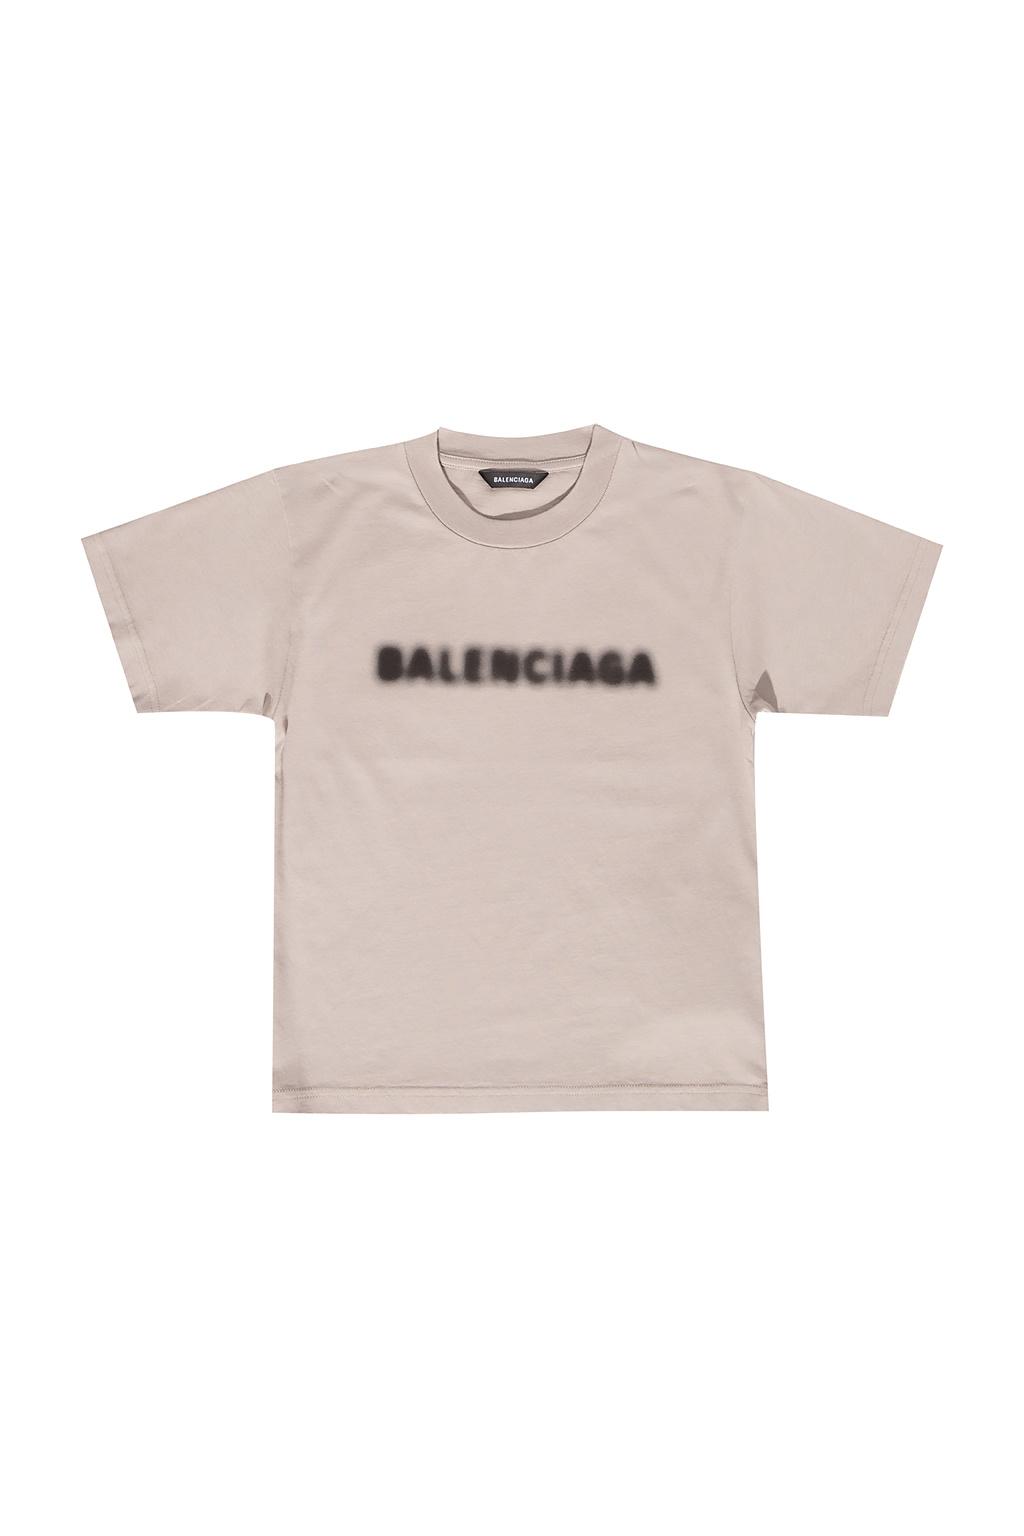 Balenciaga Kids T-shirt z nadrukowanym logo